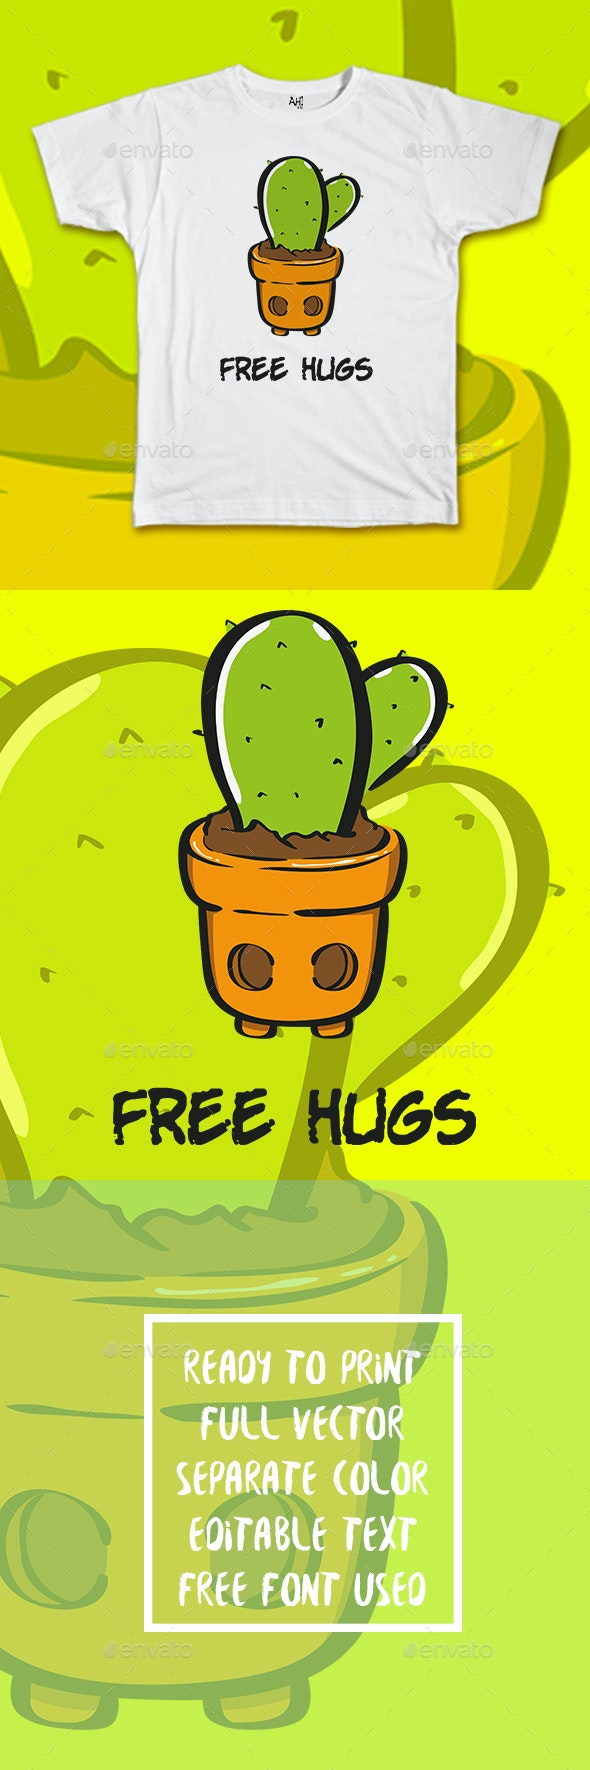 Cactus Free Hugs T-shirt Design - Funny Designs